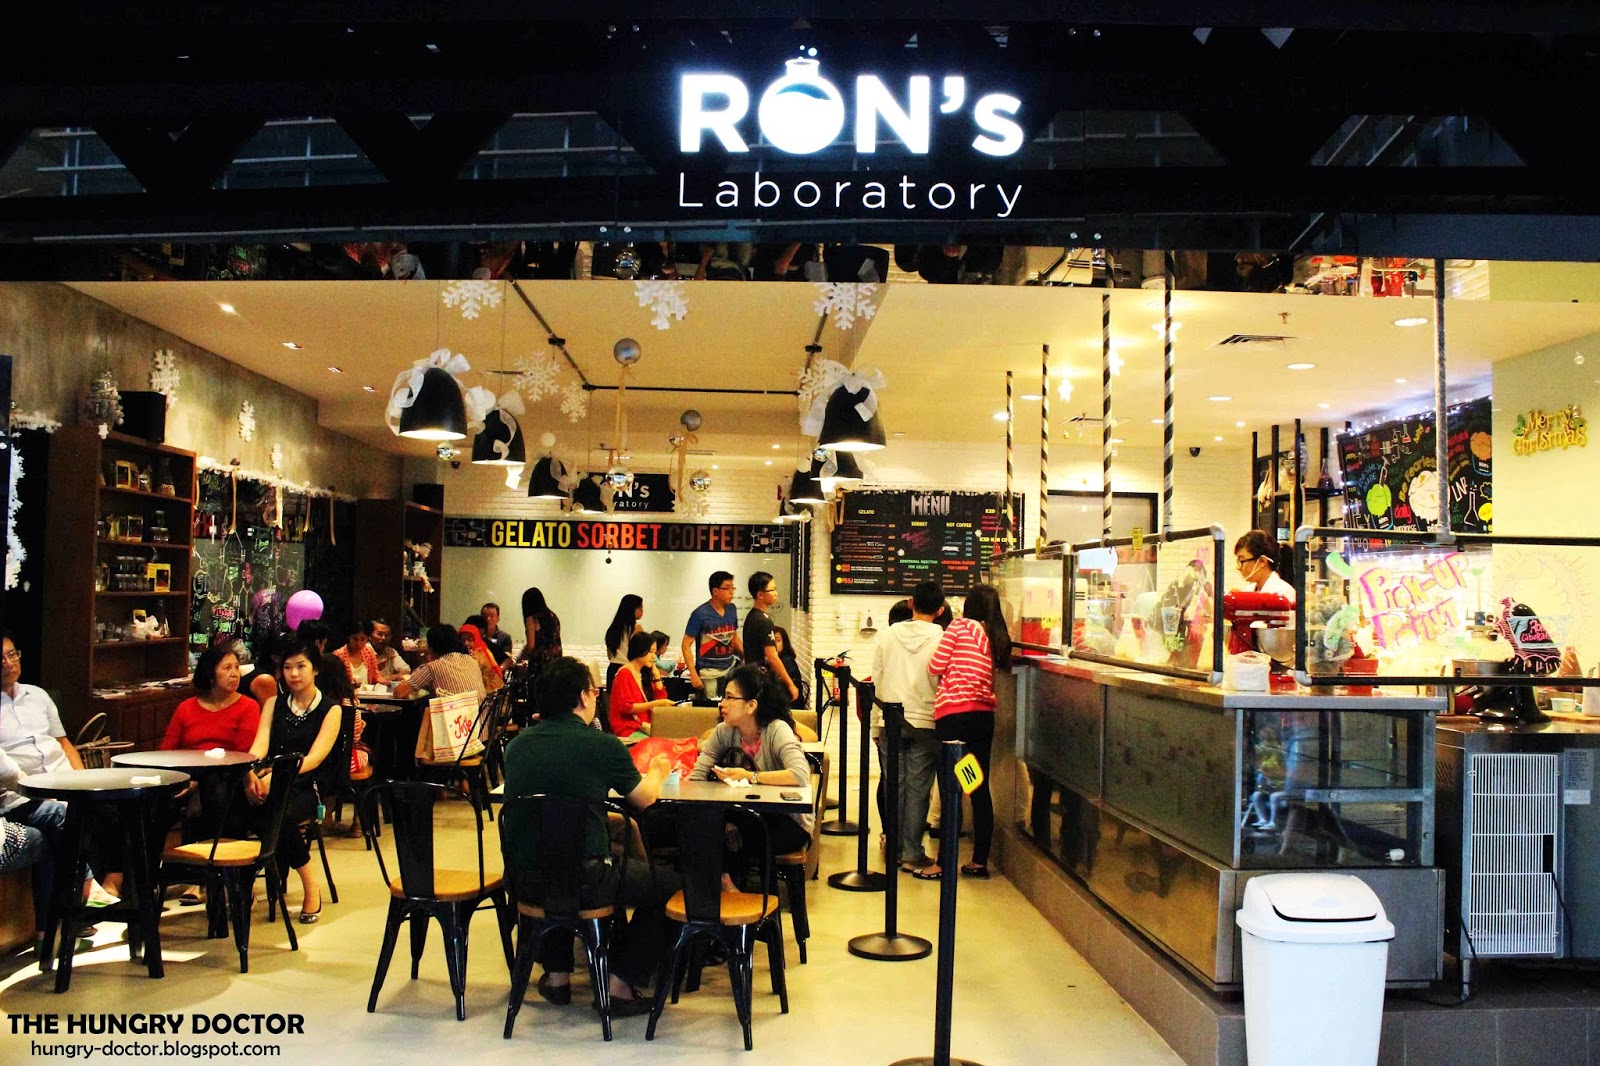 Ron's Laboratory - Another Liquid Nitrogen Ice Cream in Town